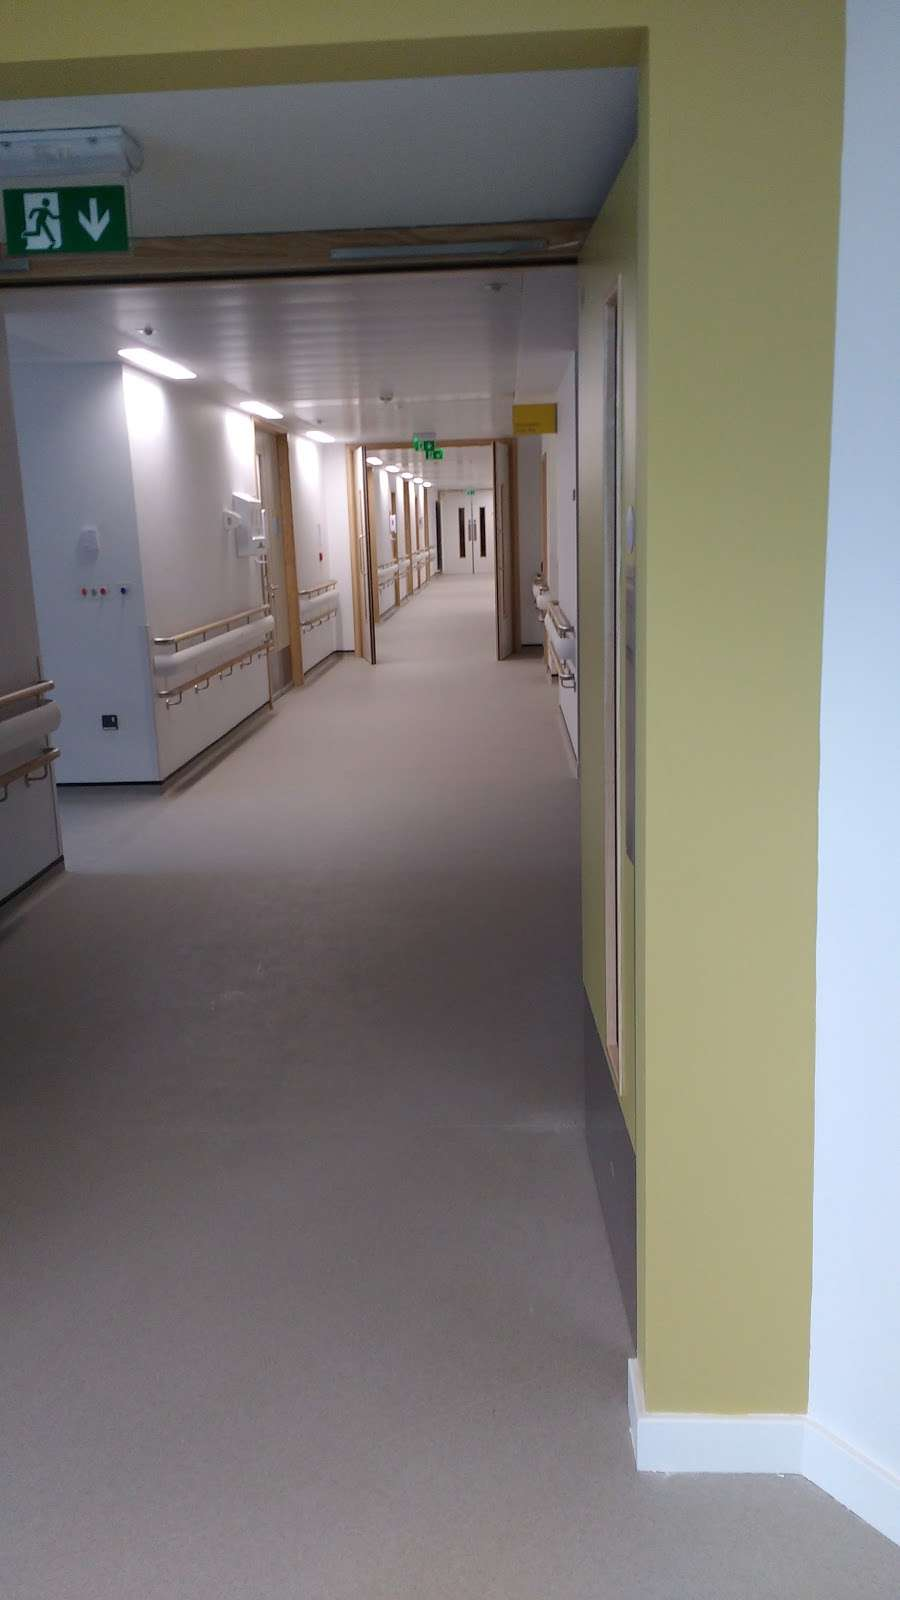 Royal National Orthopaedic Hospital - hospital    Photo 10 of 10   Address: Brockley Hill, Stanmore HA7 4LP, UK   Phone: 020 3947 0100